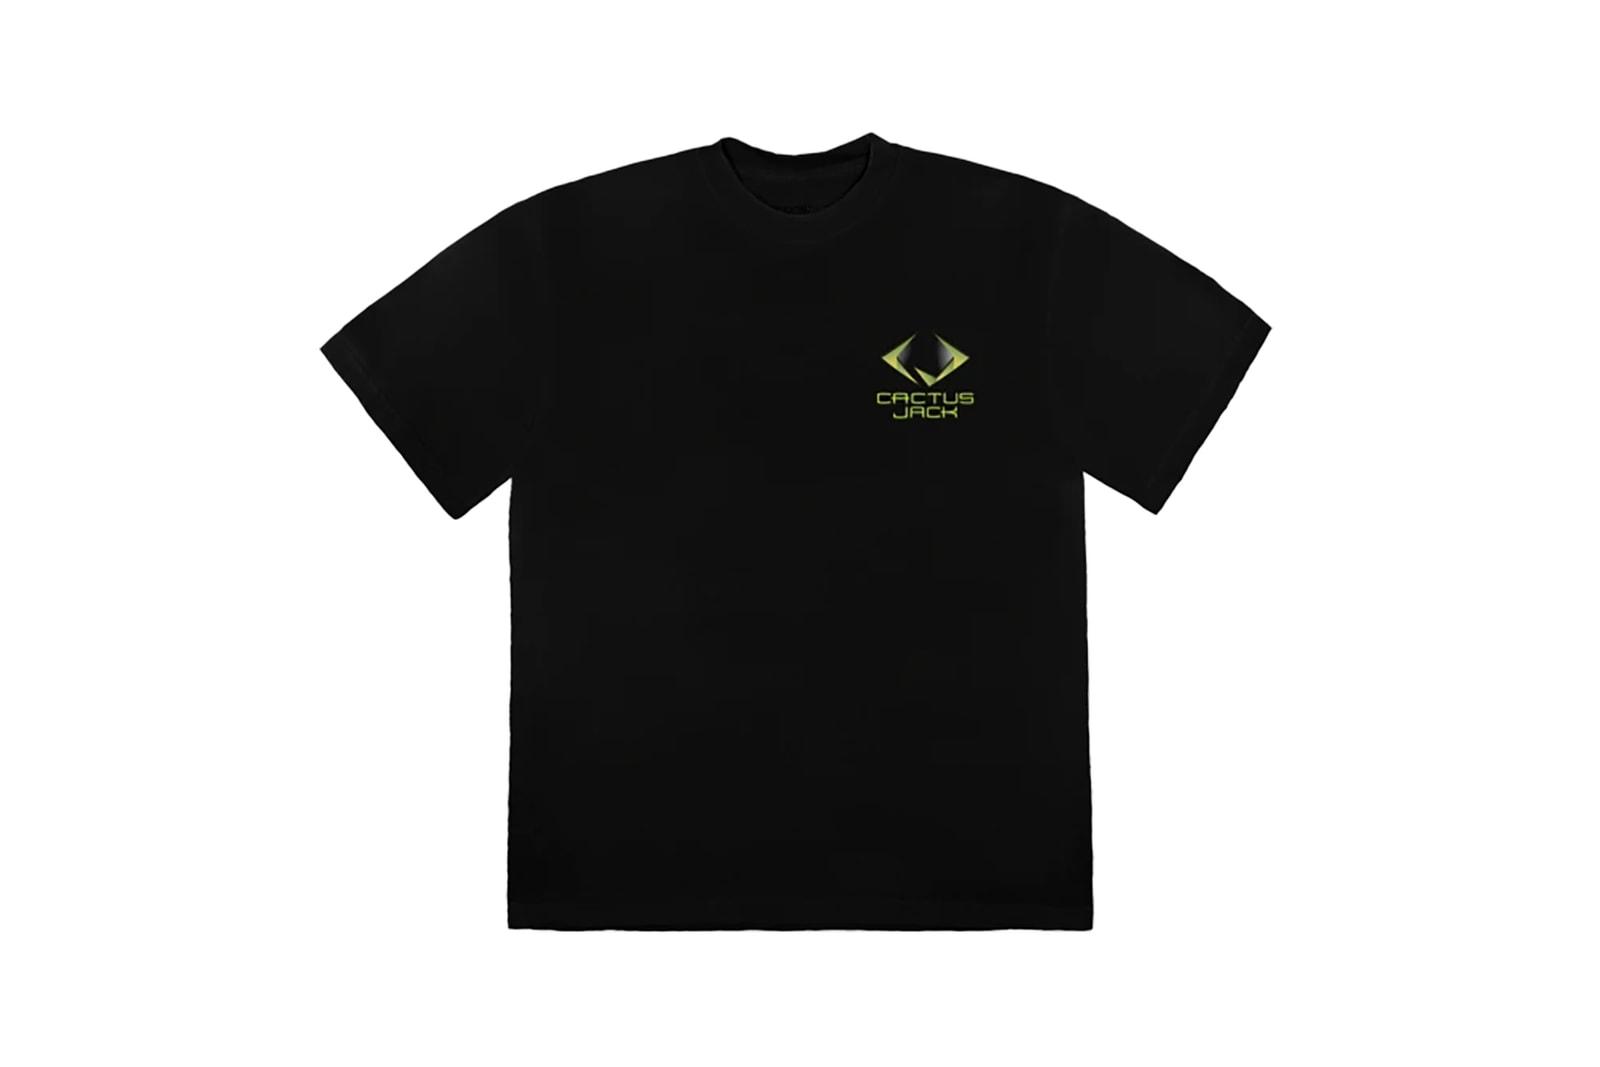 Travis Scott Fortnite Astronomical Tour Concert Merch The Scotts Hoodie T-Shirt